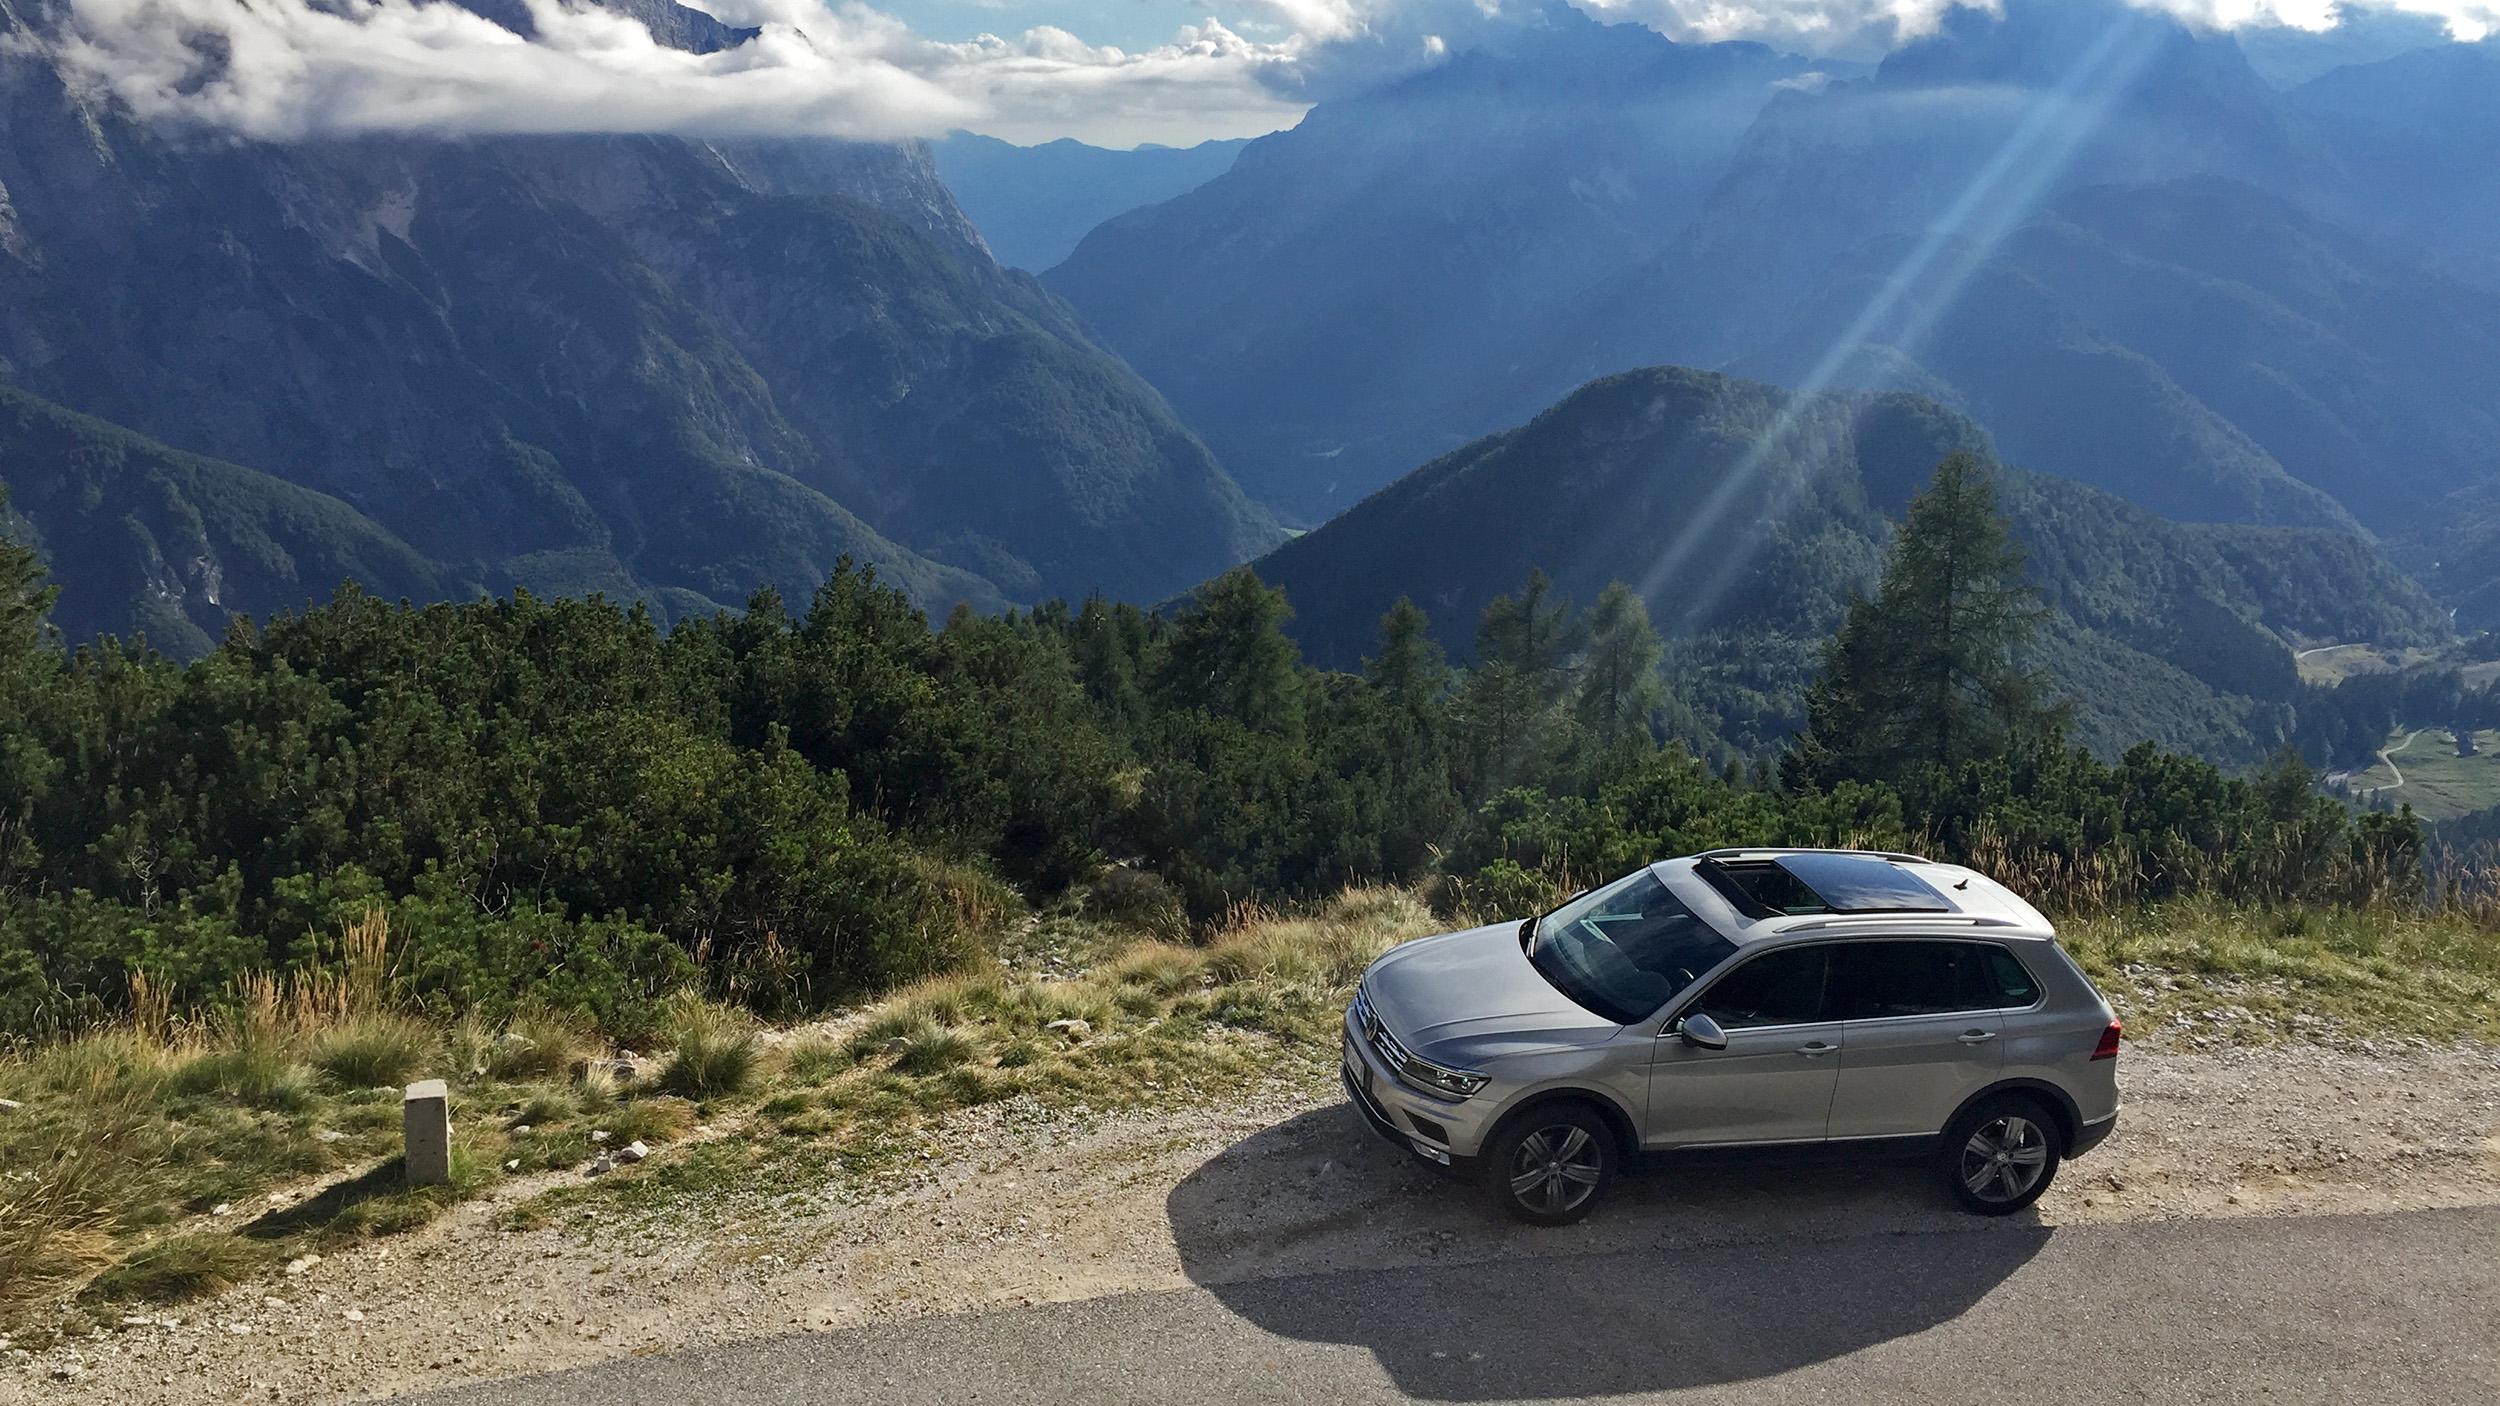 Worlds greatest driving roads Julian Alps Slovenia  Photos